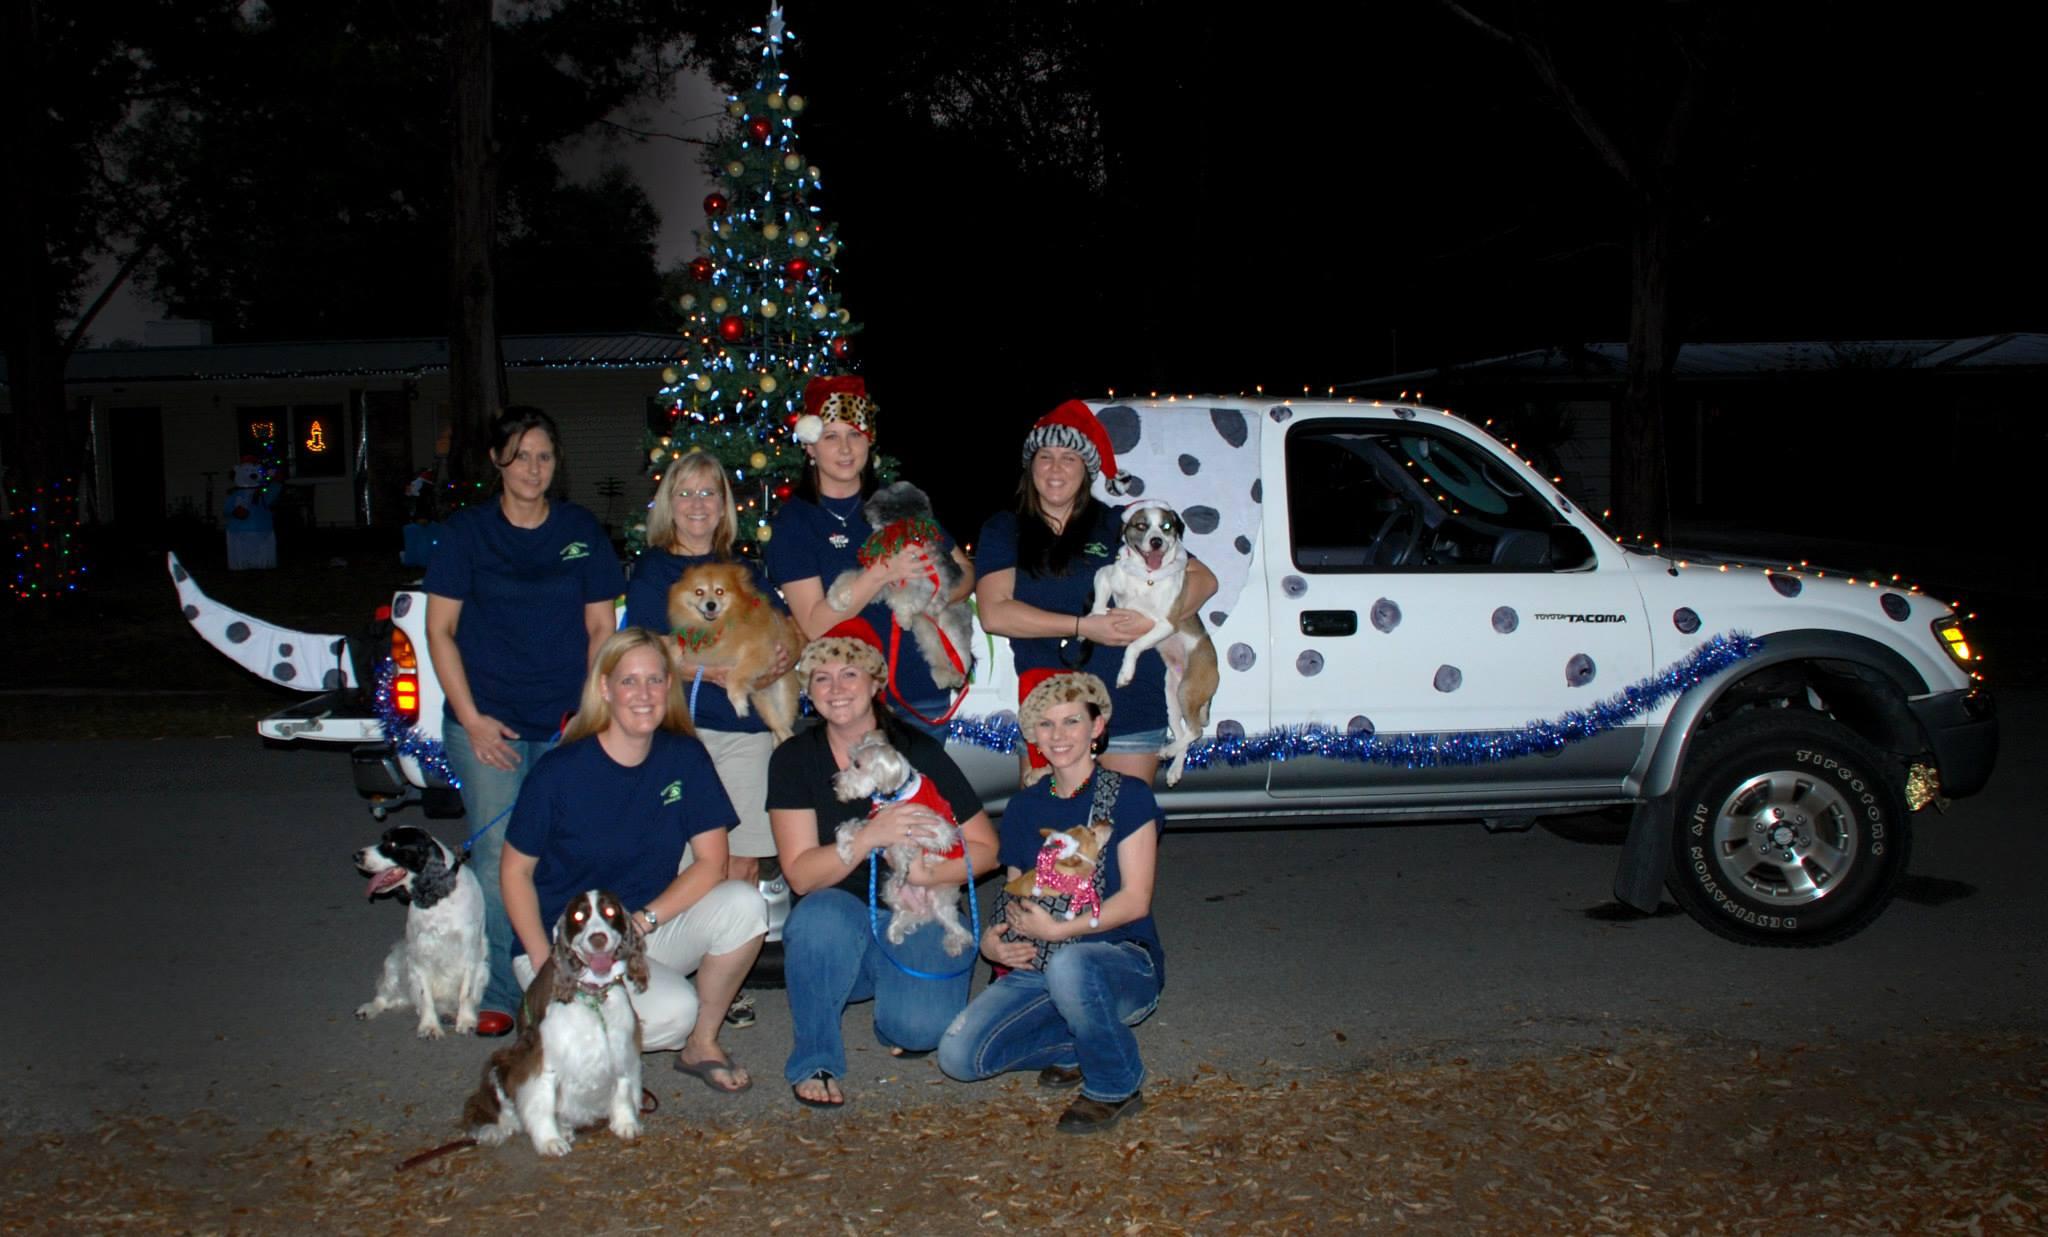 Christmas parade ideas - Keystone Heights Animal Hospital Christmas Parade 2013